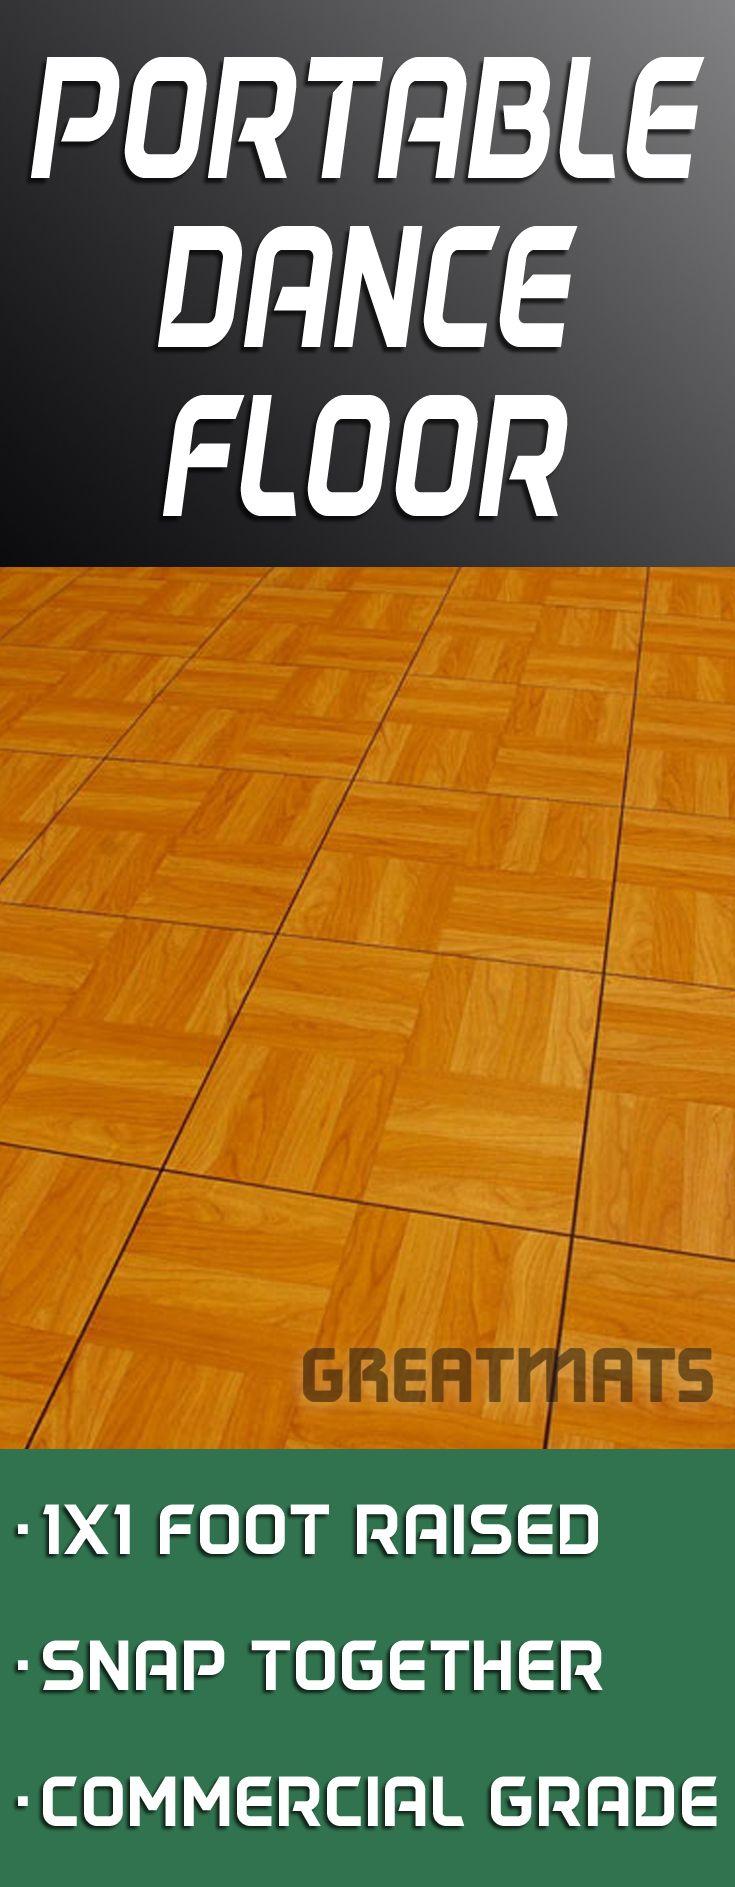 Greatmats Portable Dance Floor Tiles Feature A Commercial Grade